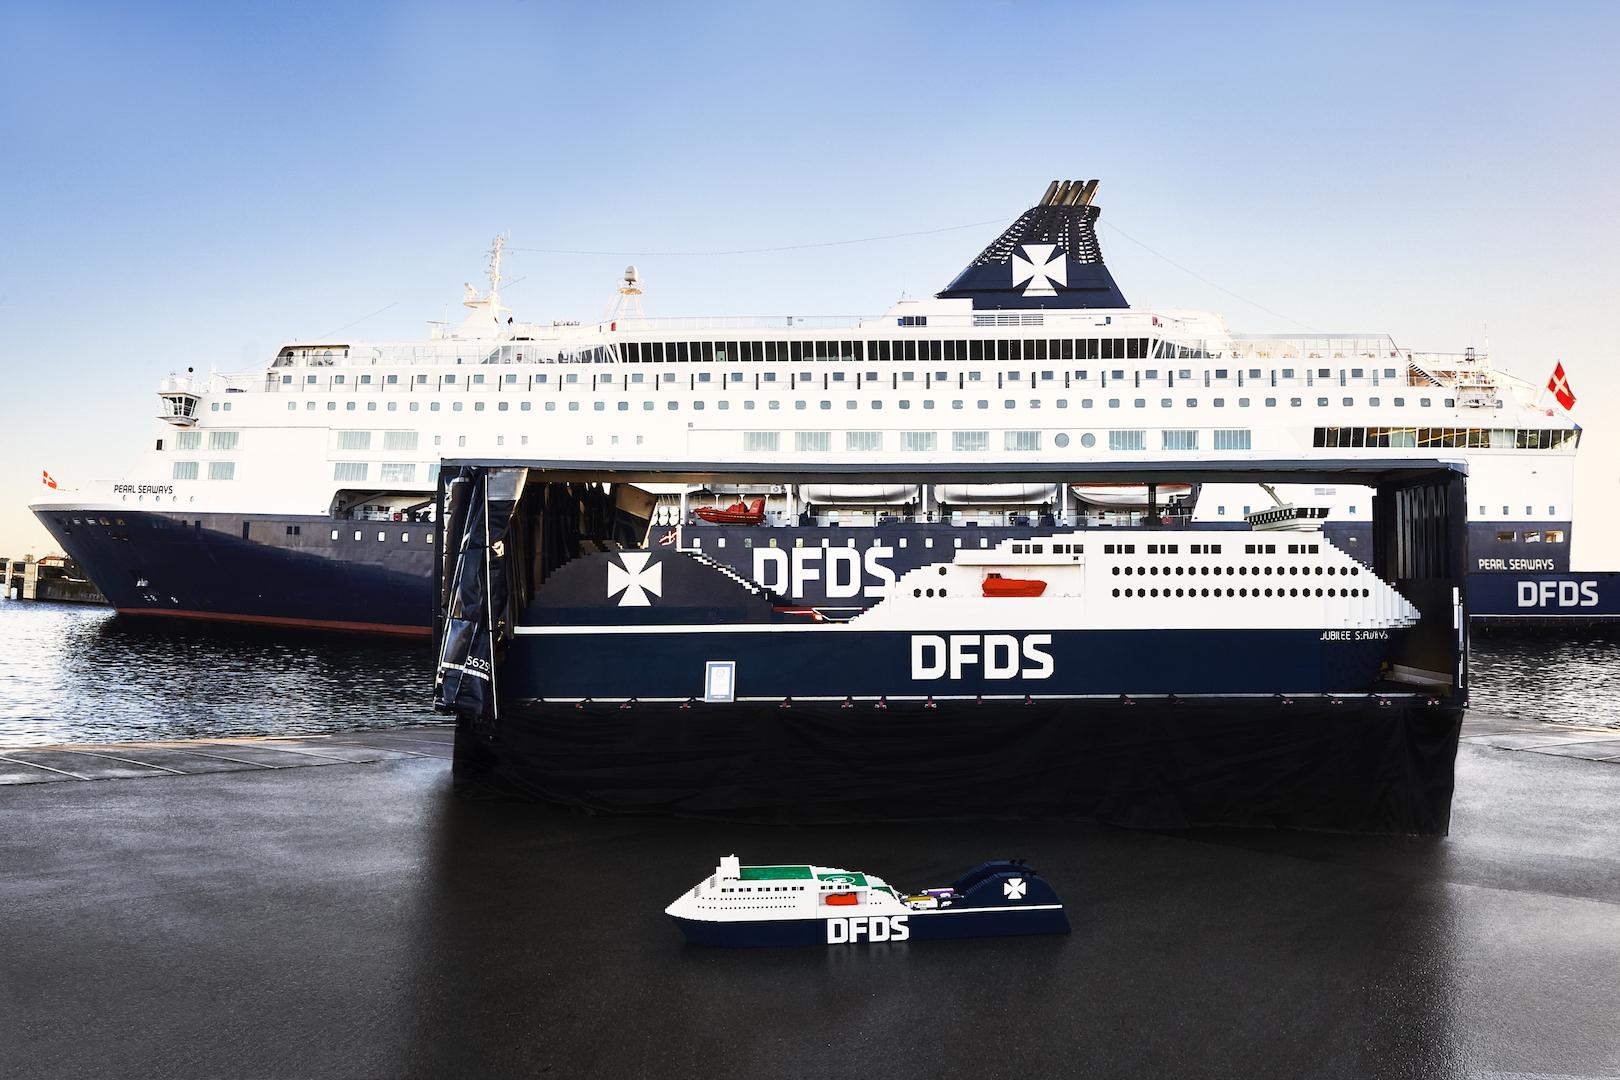 DFDS 3-i-1_3 Small.jpeg